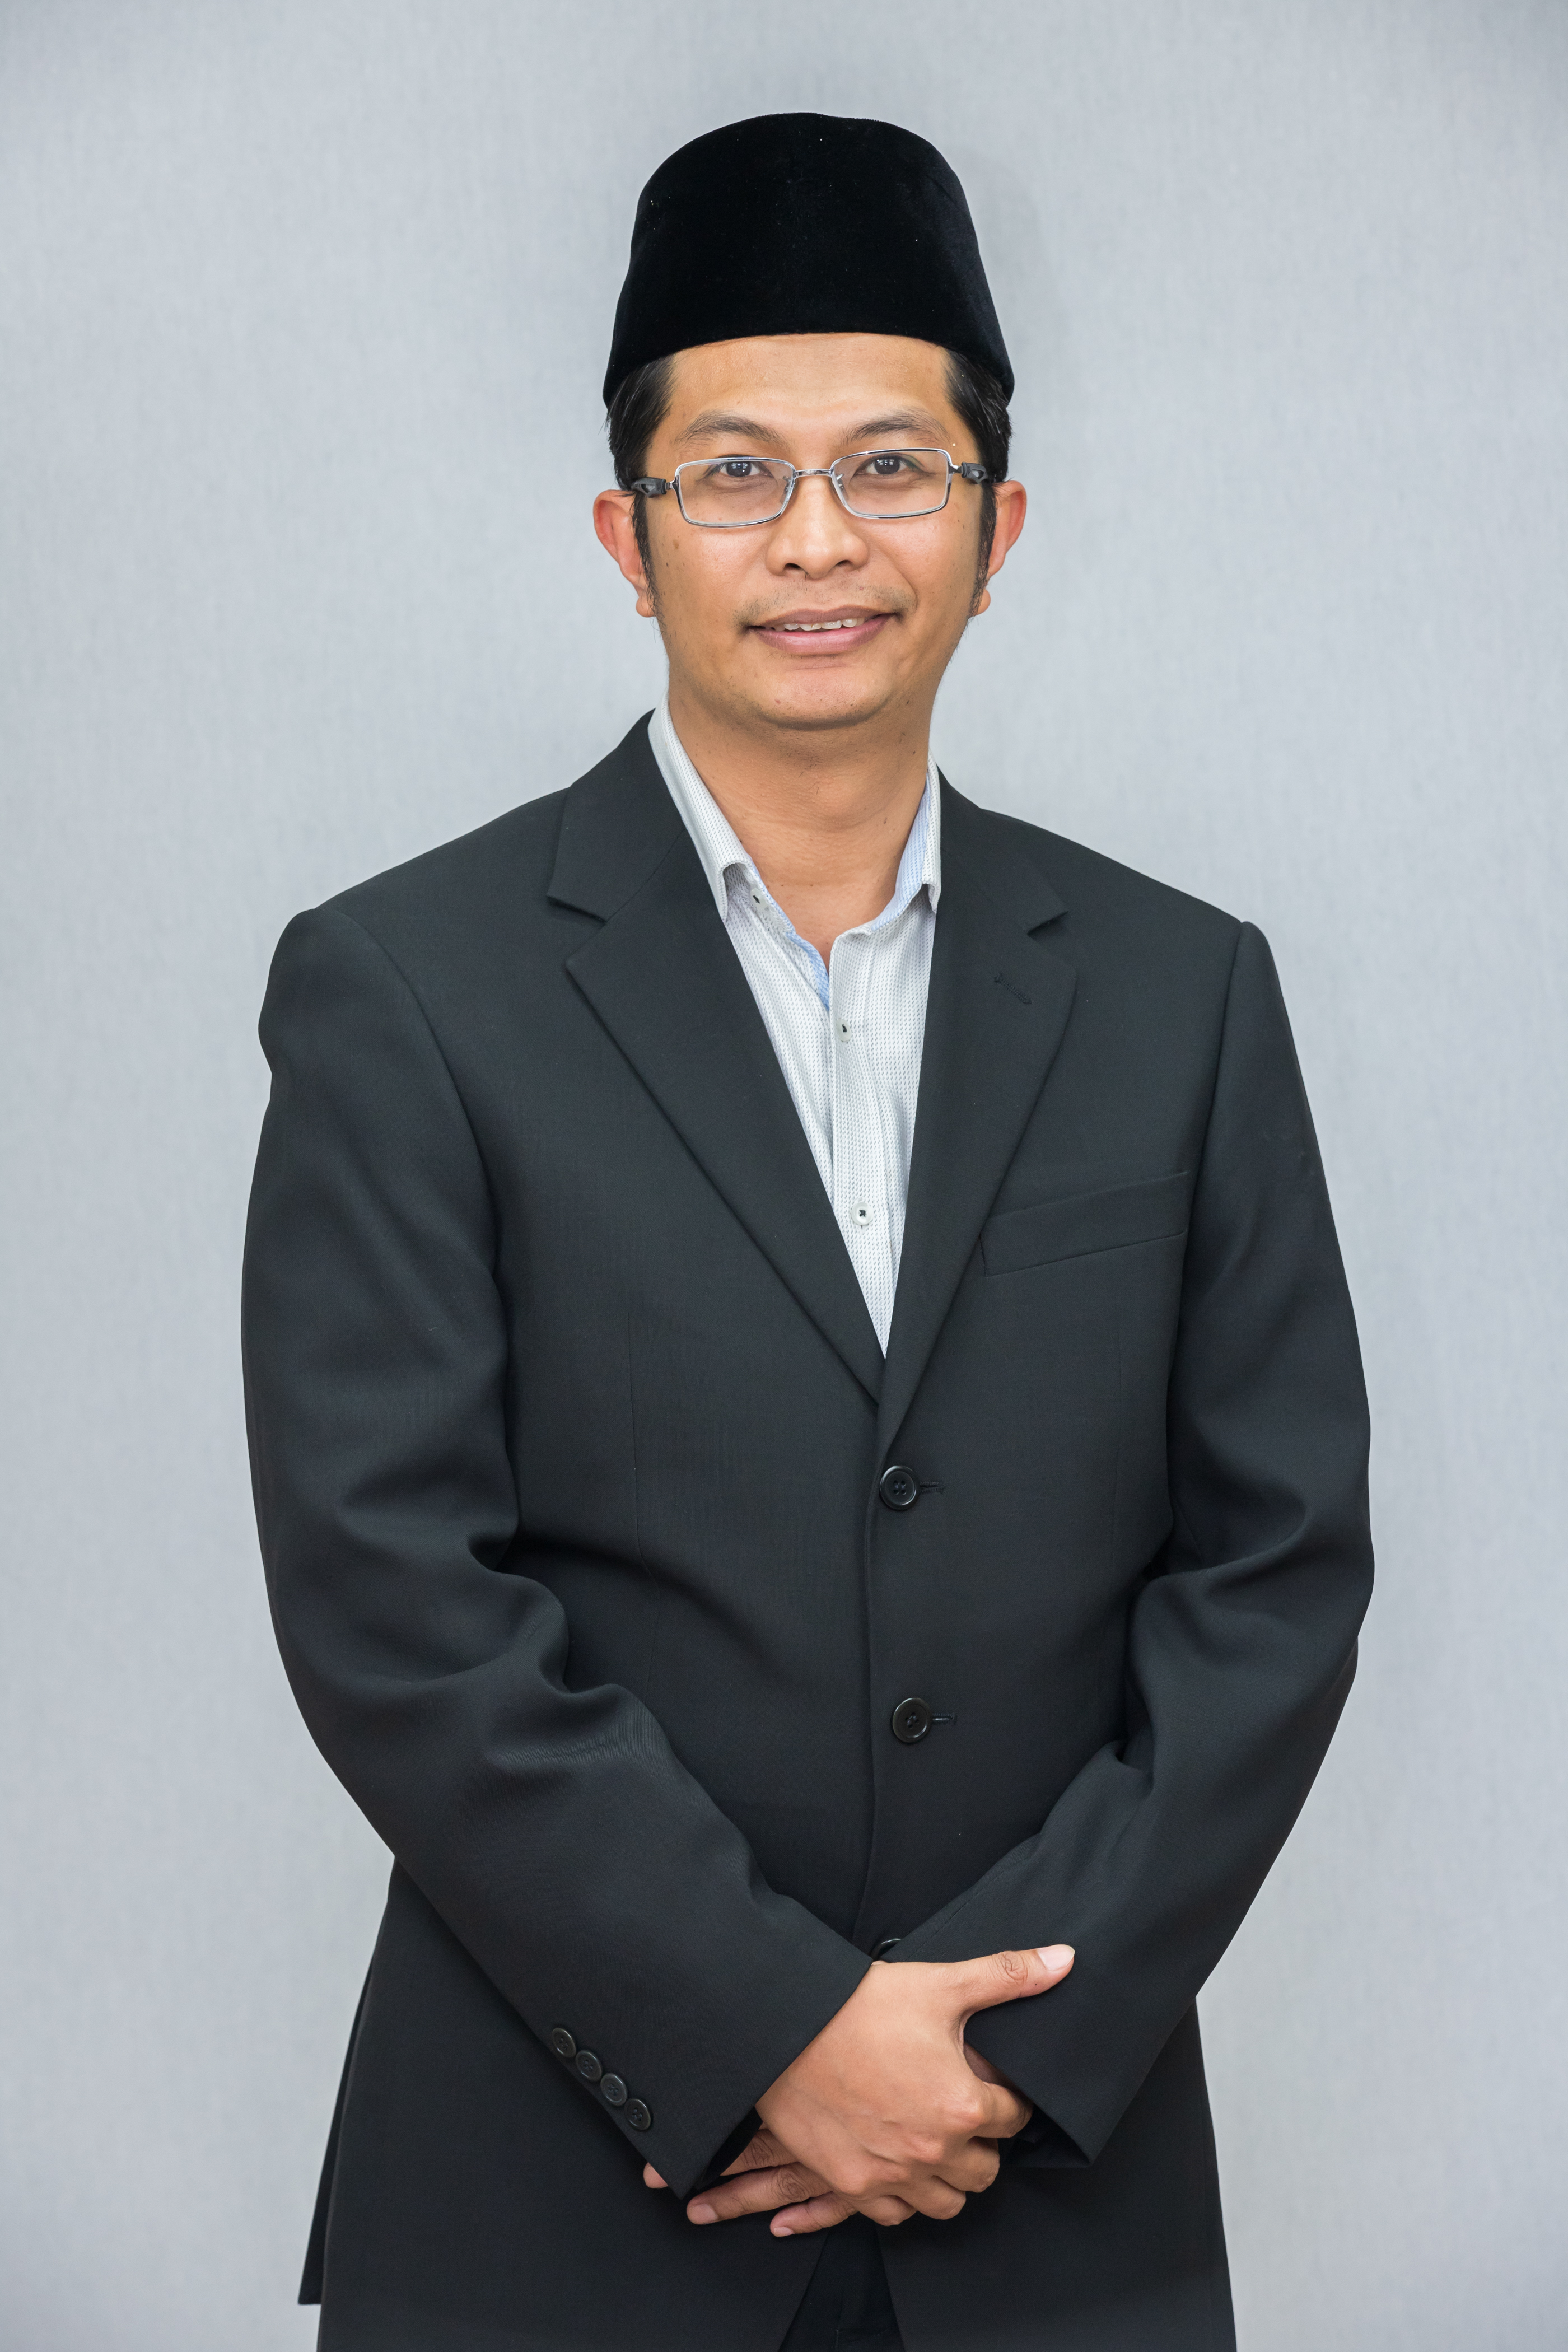 Mohd Fairus Abd Manaf